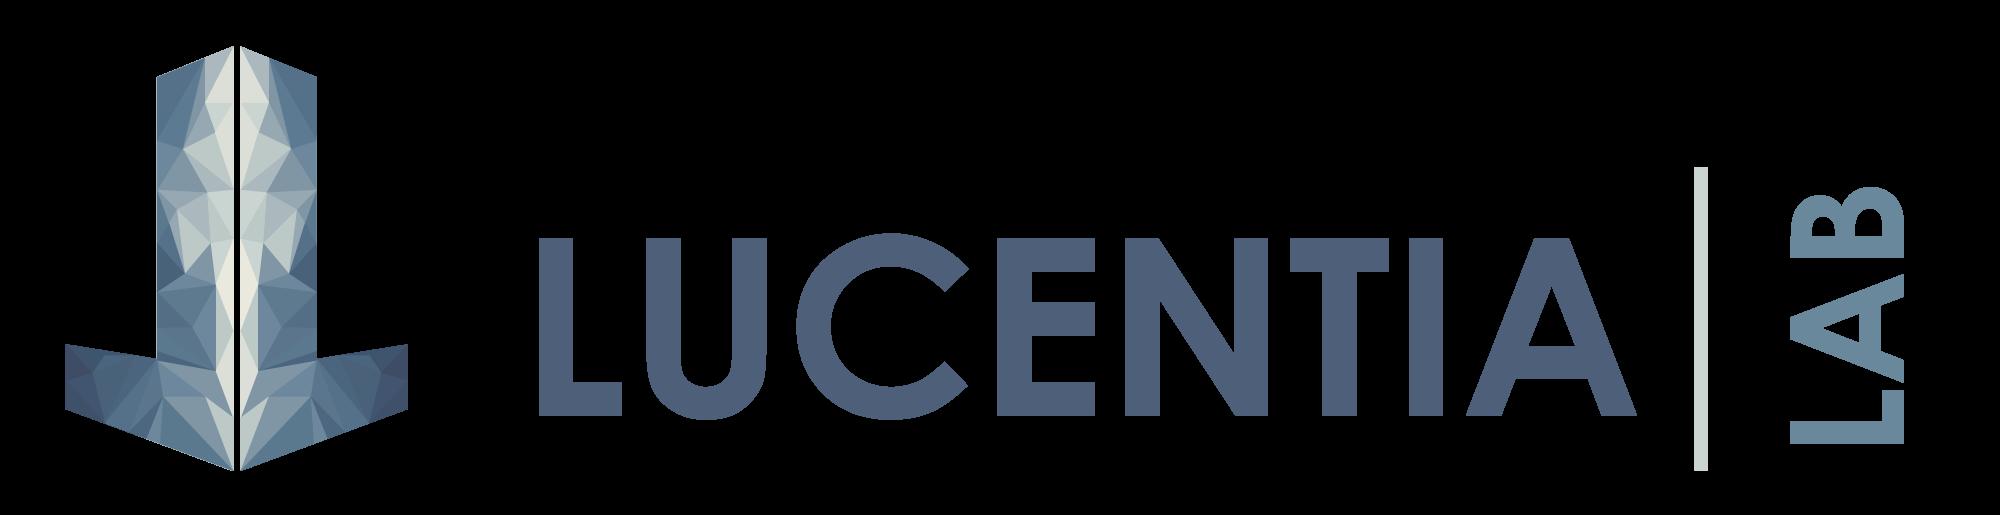 LucentiaLab